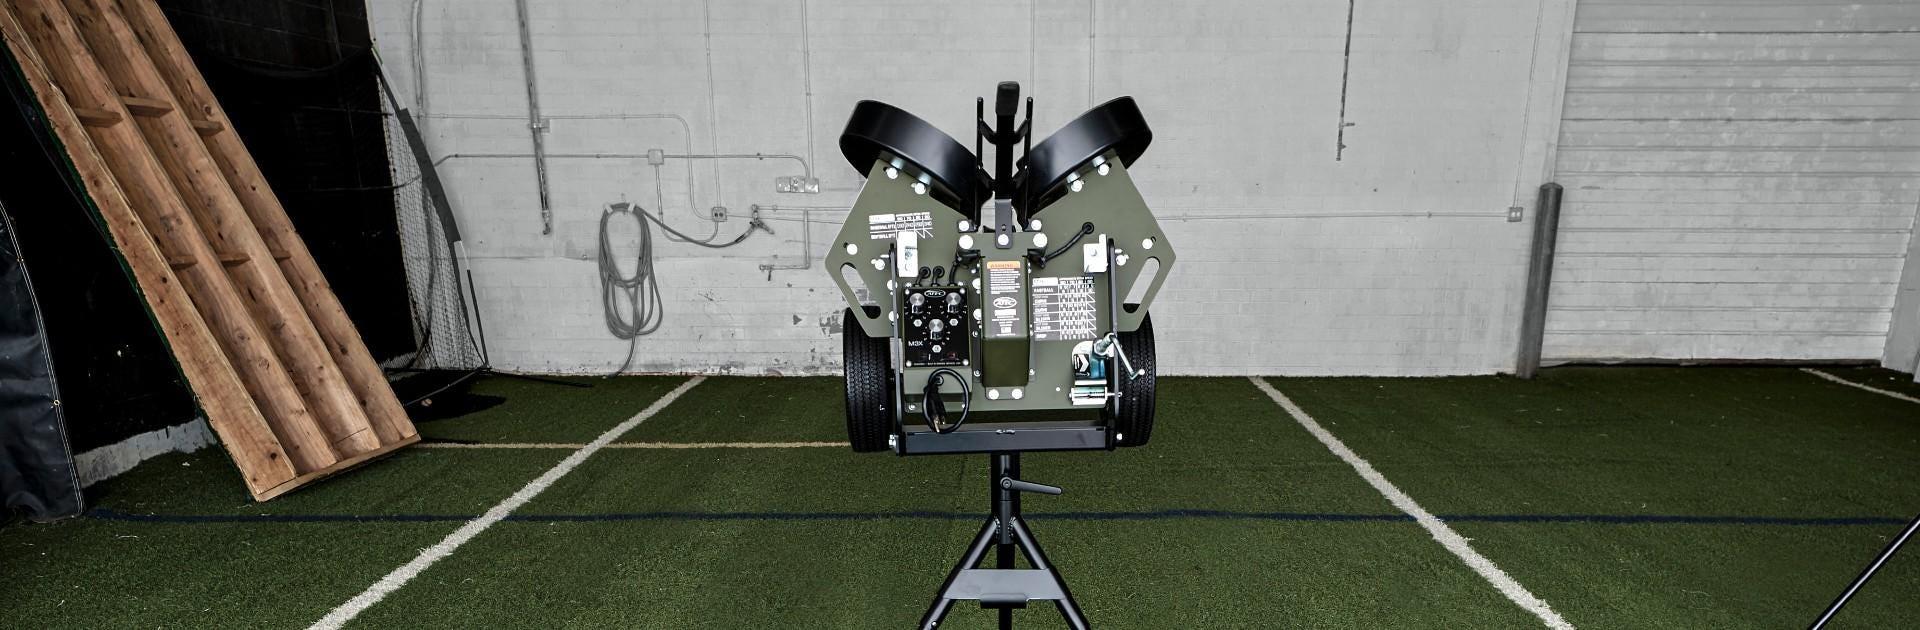 ATEC-M3X-Pitching-Machine-Training